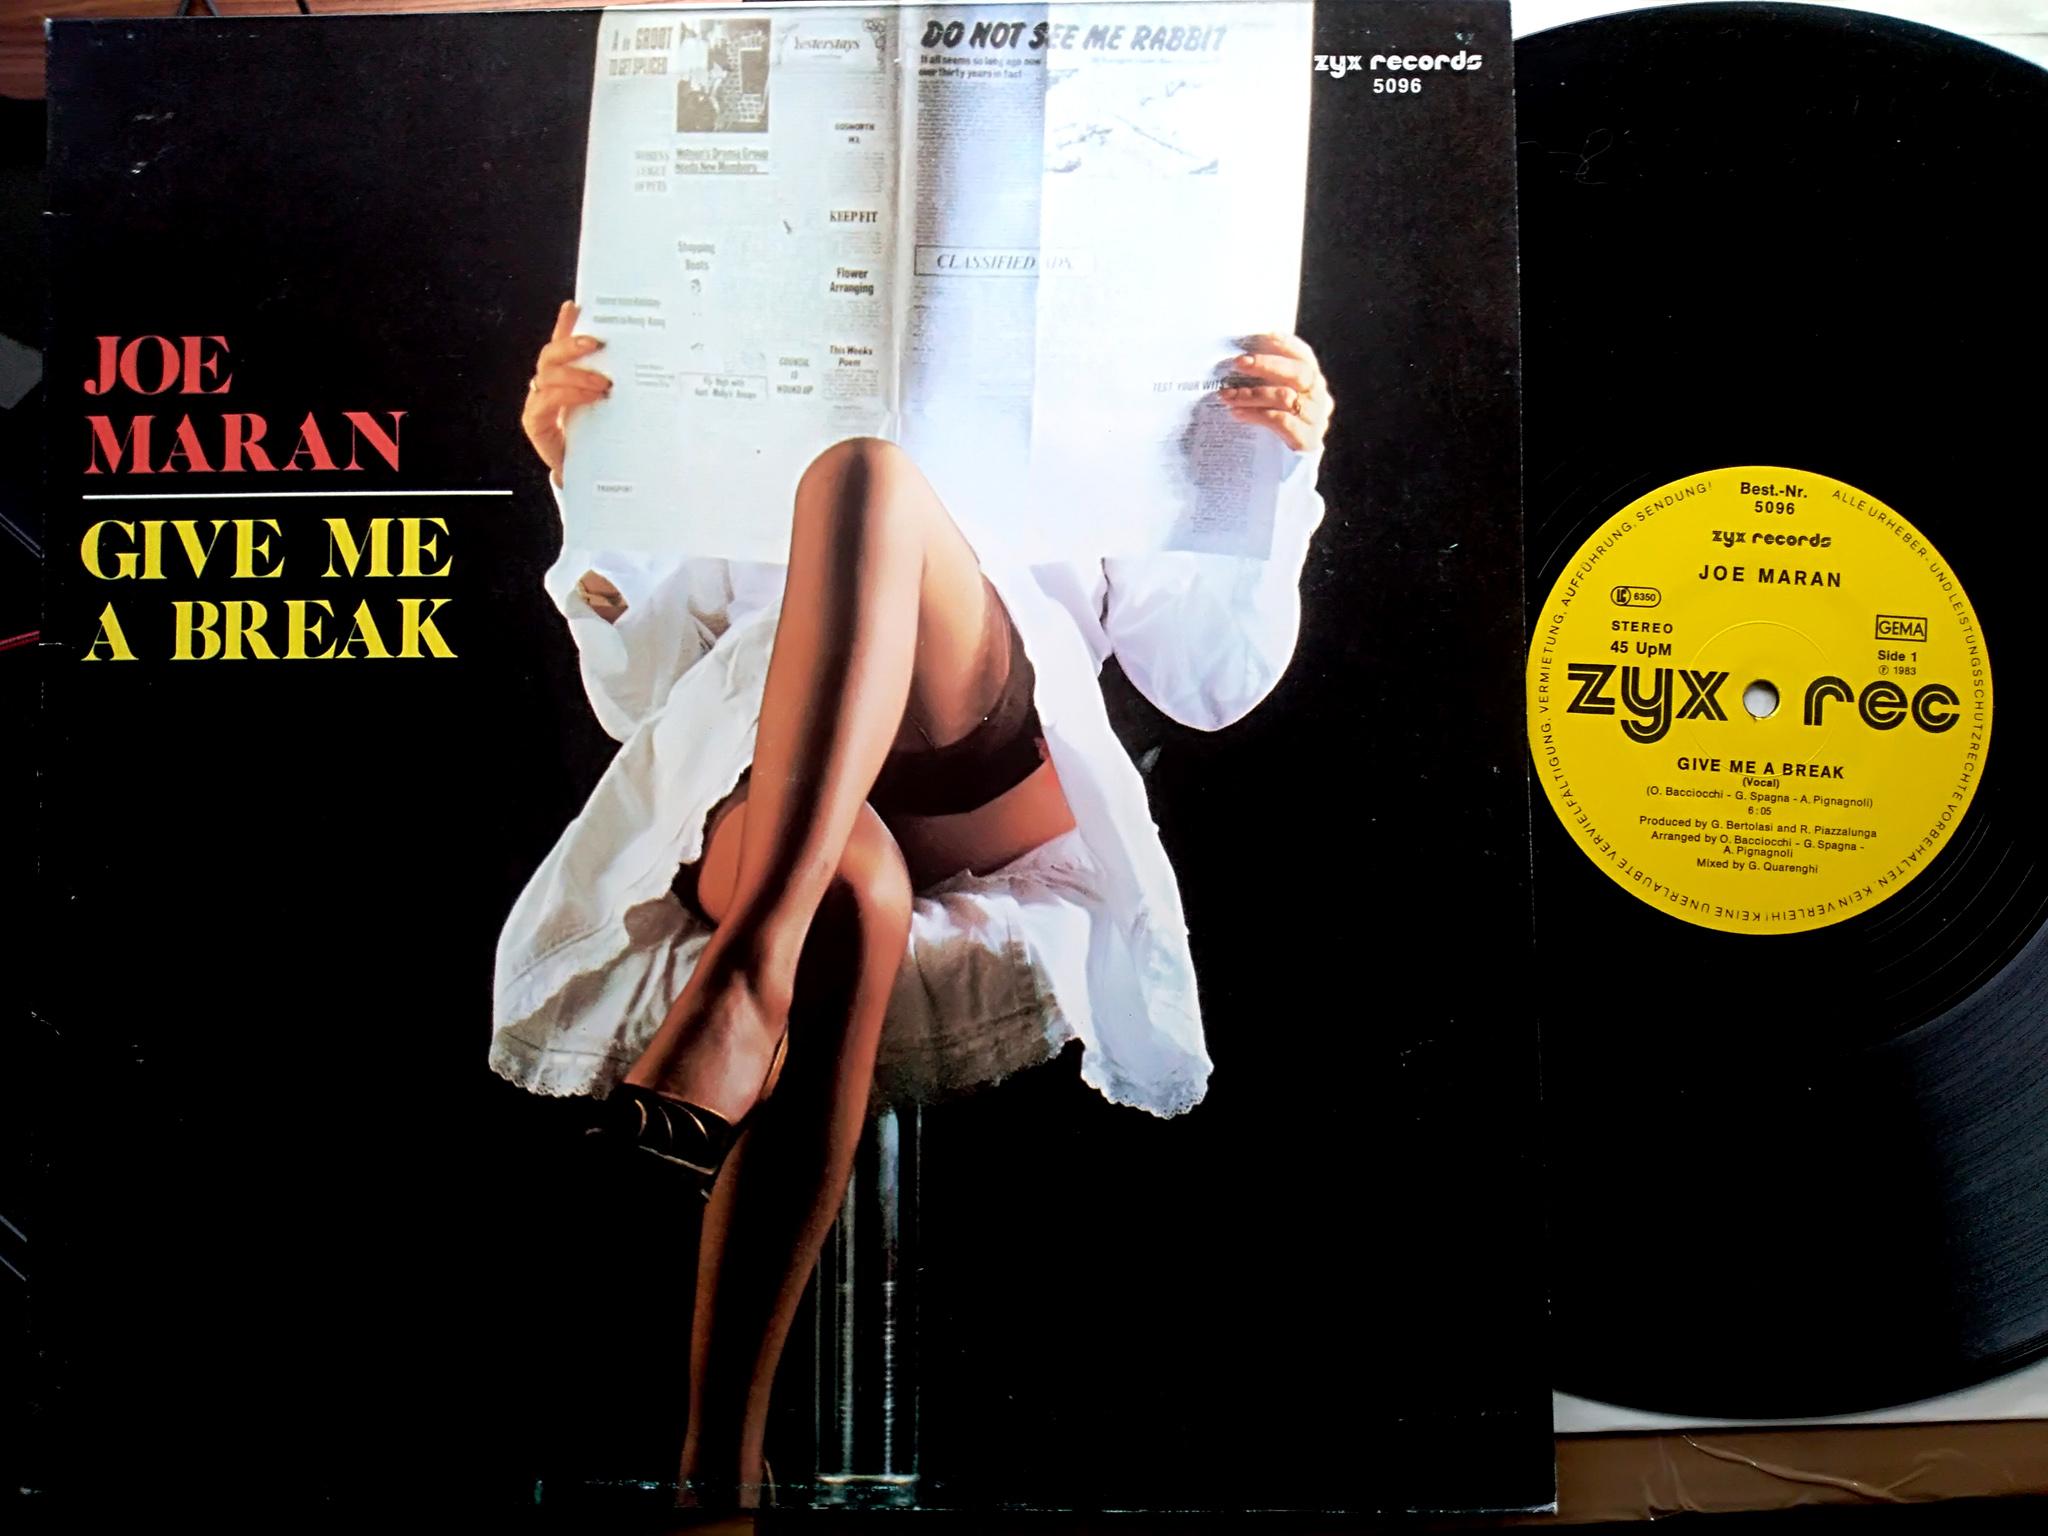 Joe Maran - Give  Me A Break